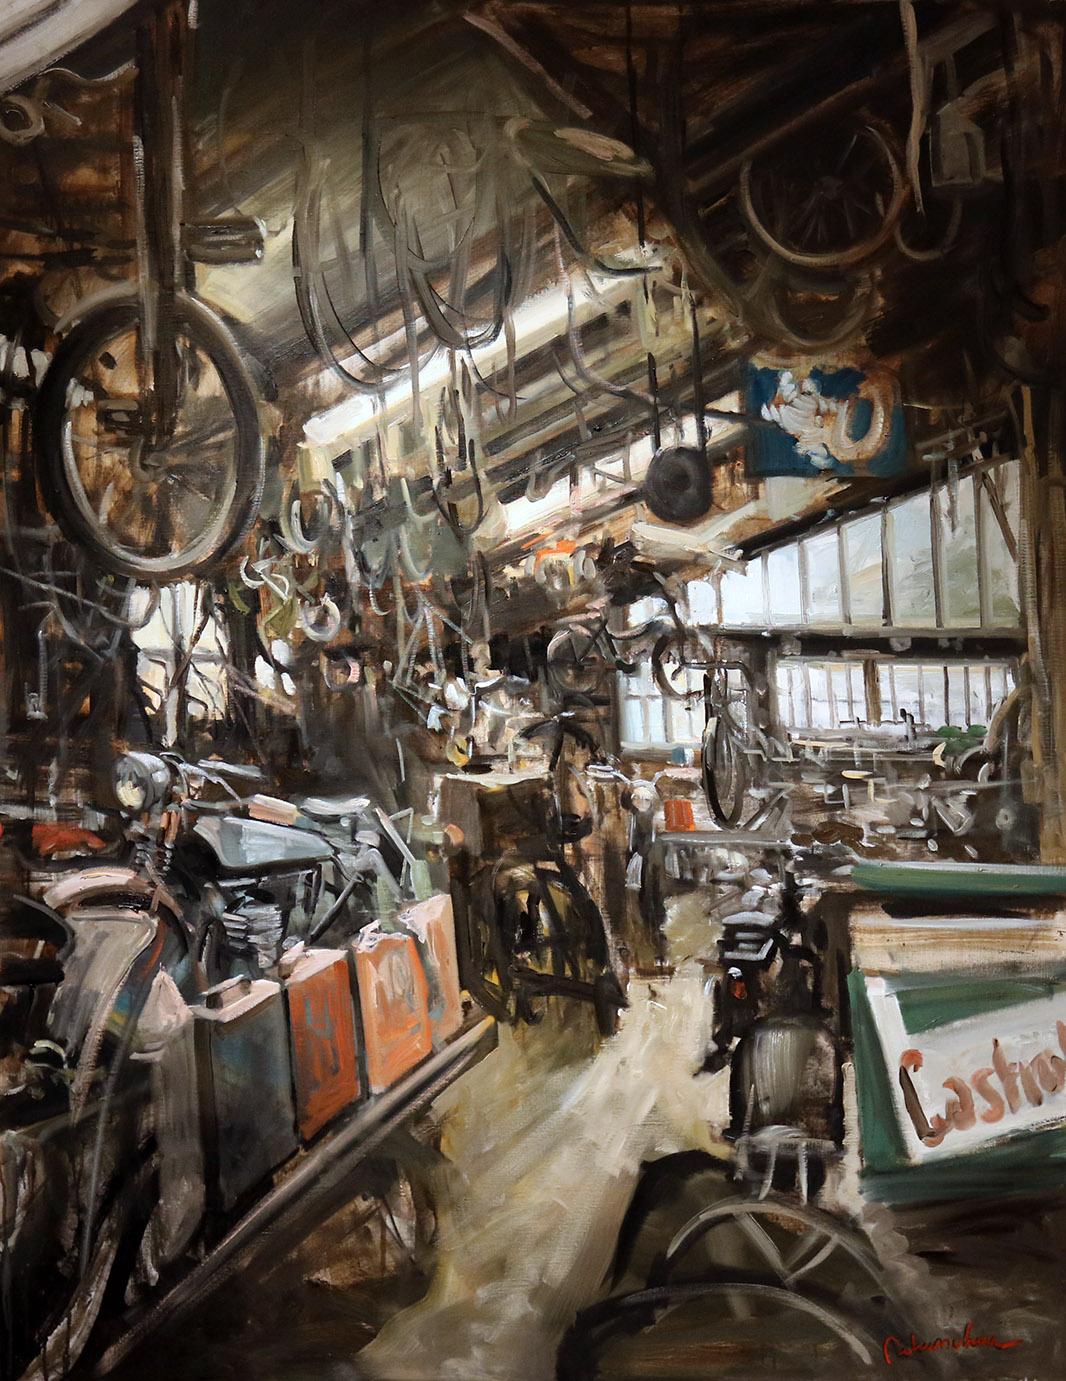 Christoff DEBUSSCHERE - 61 - Le garage en Bourgogne - 80F (146 x 114 cm)